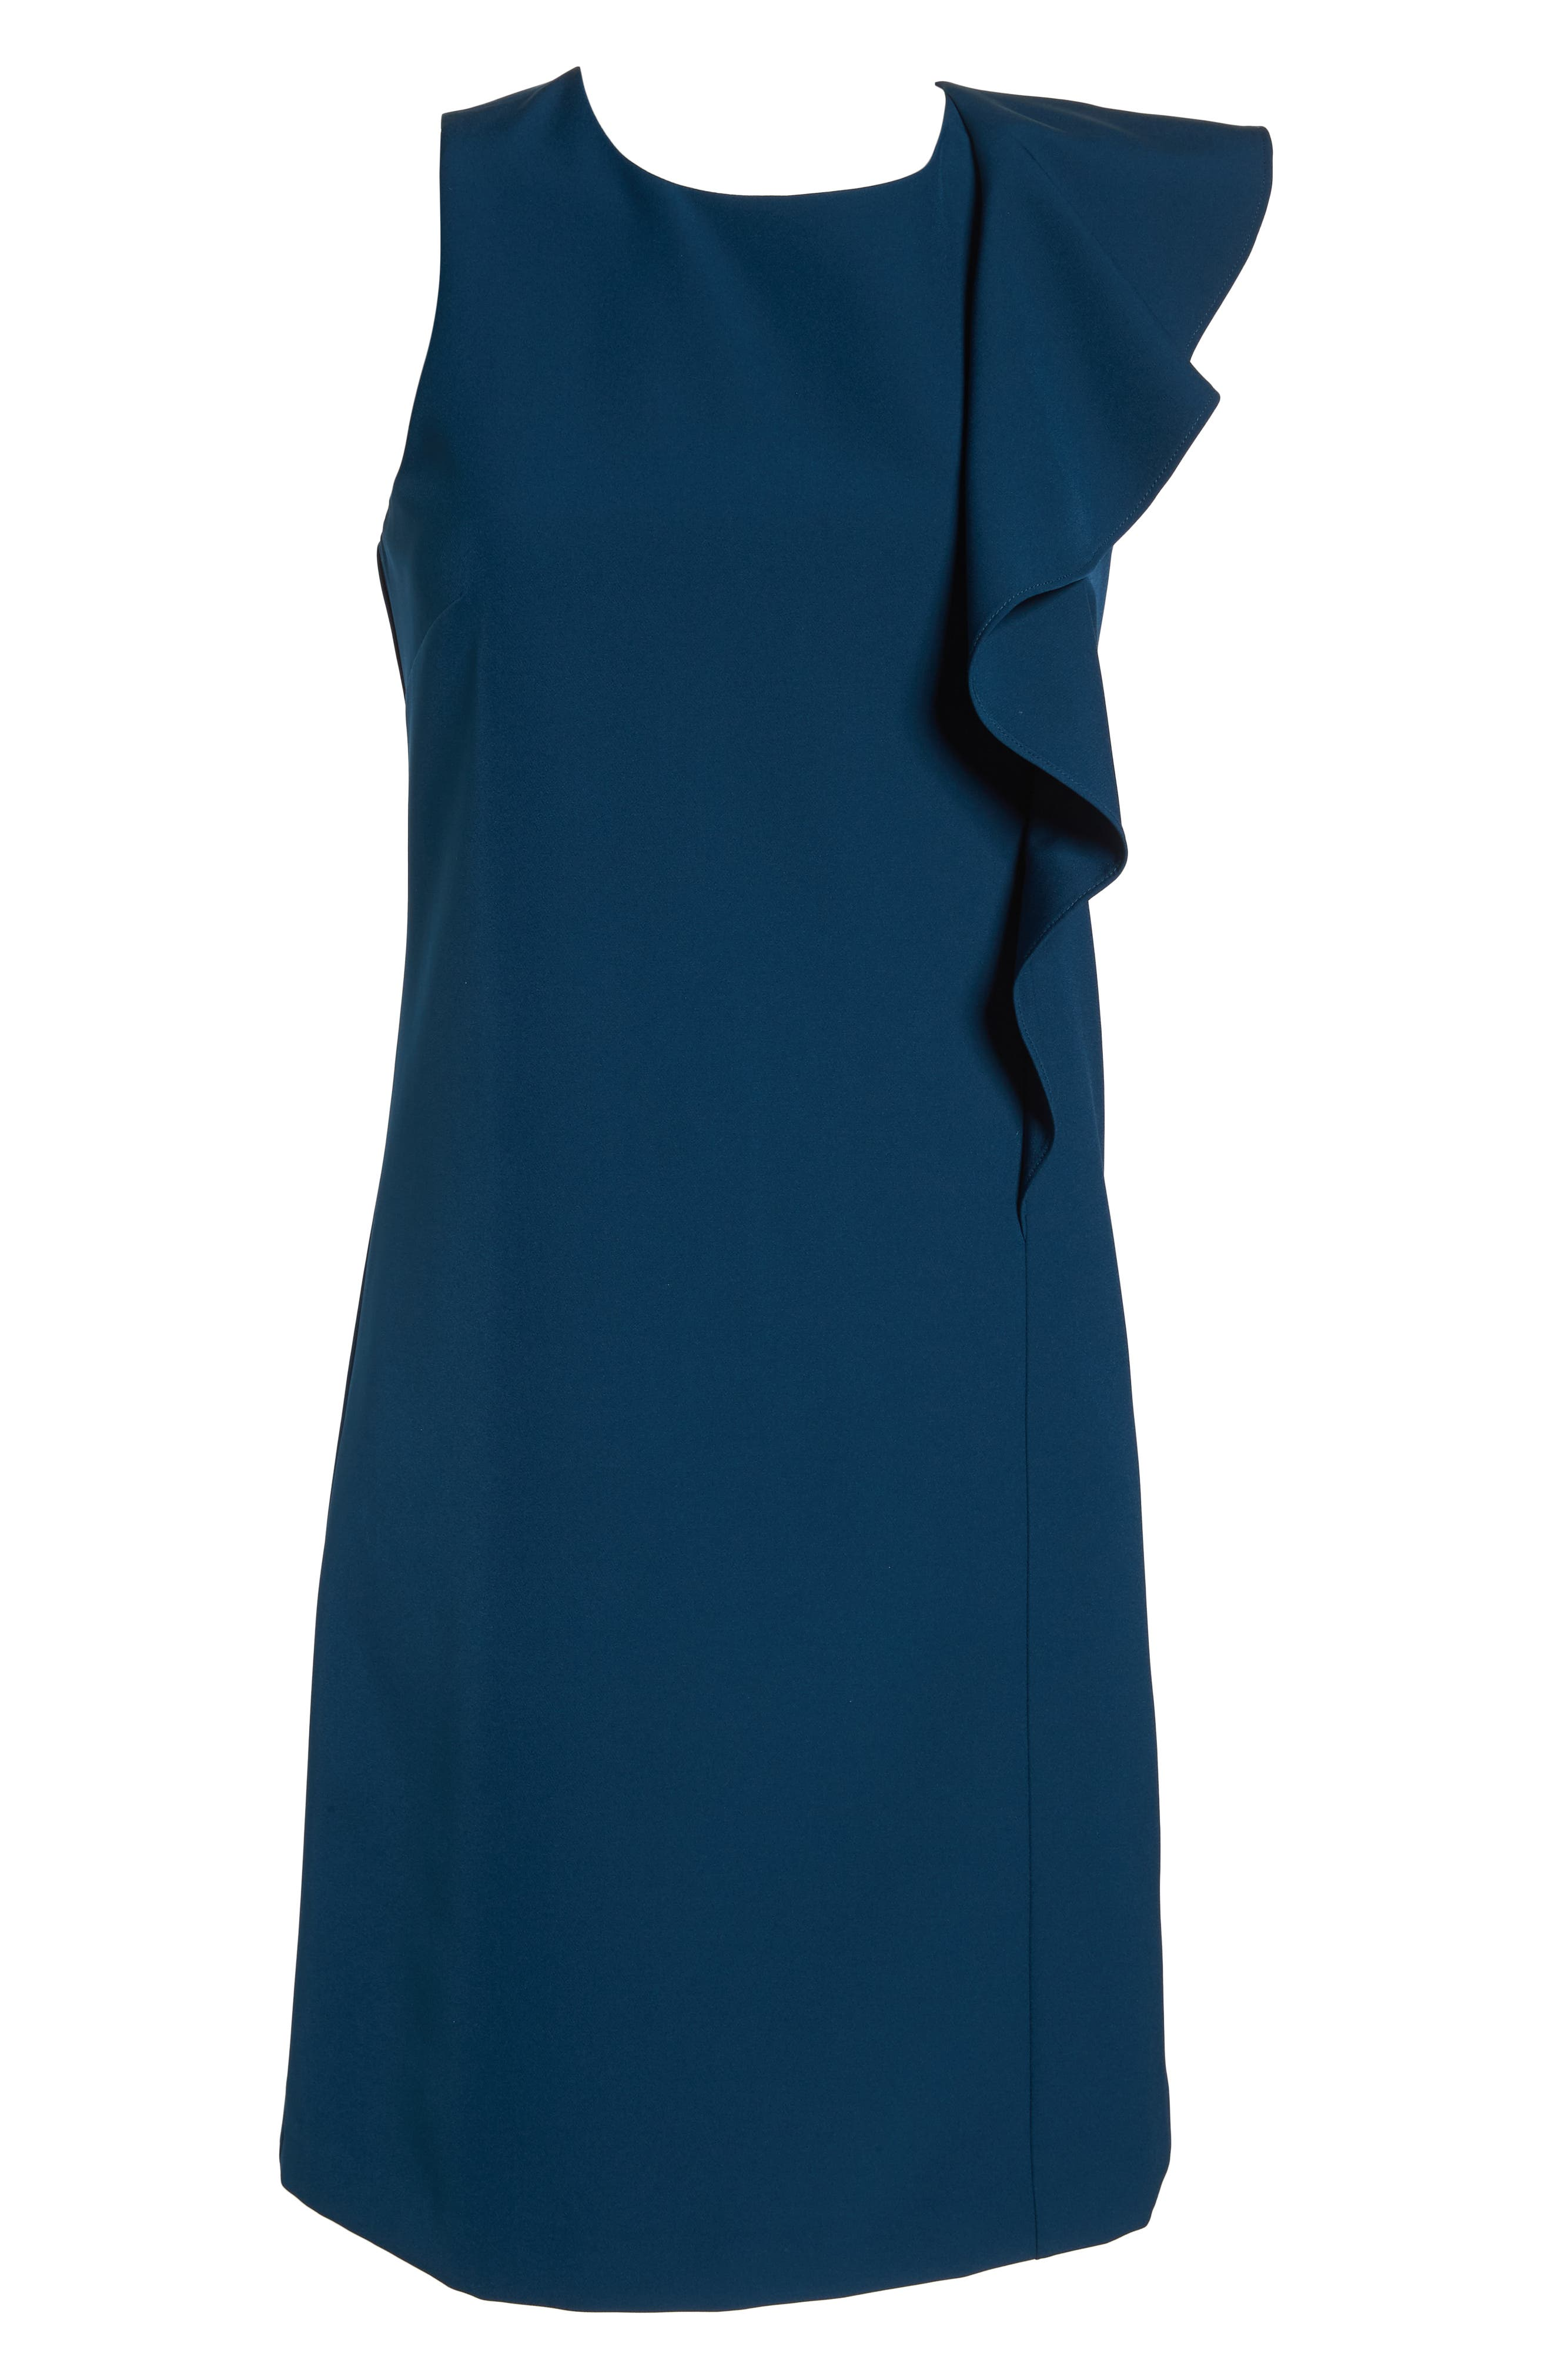 Ruffle Crepe A-Line Dress,                             Alternate thumbnail 7, color,                             450